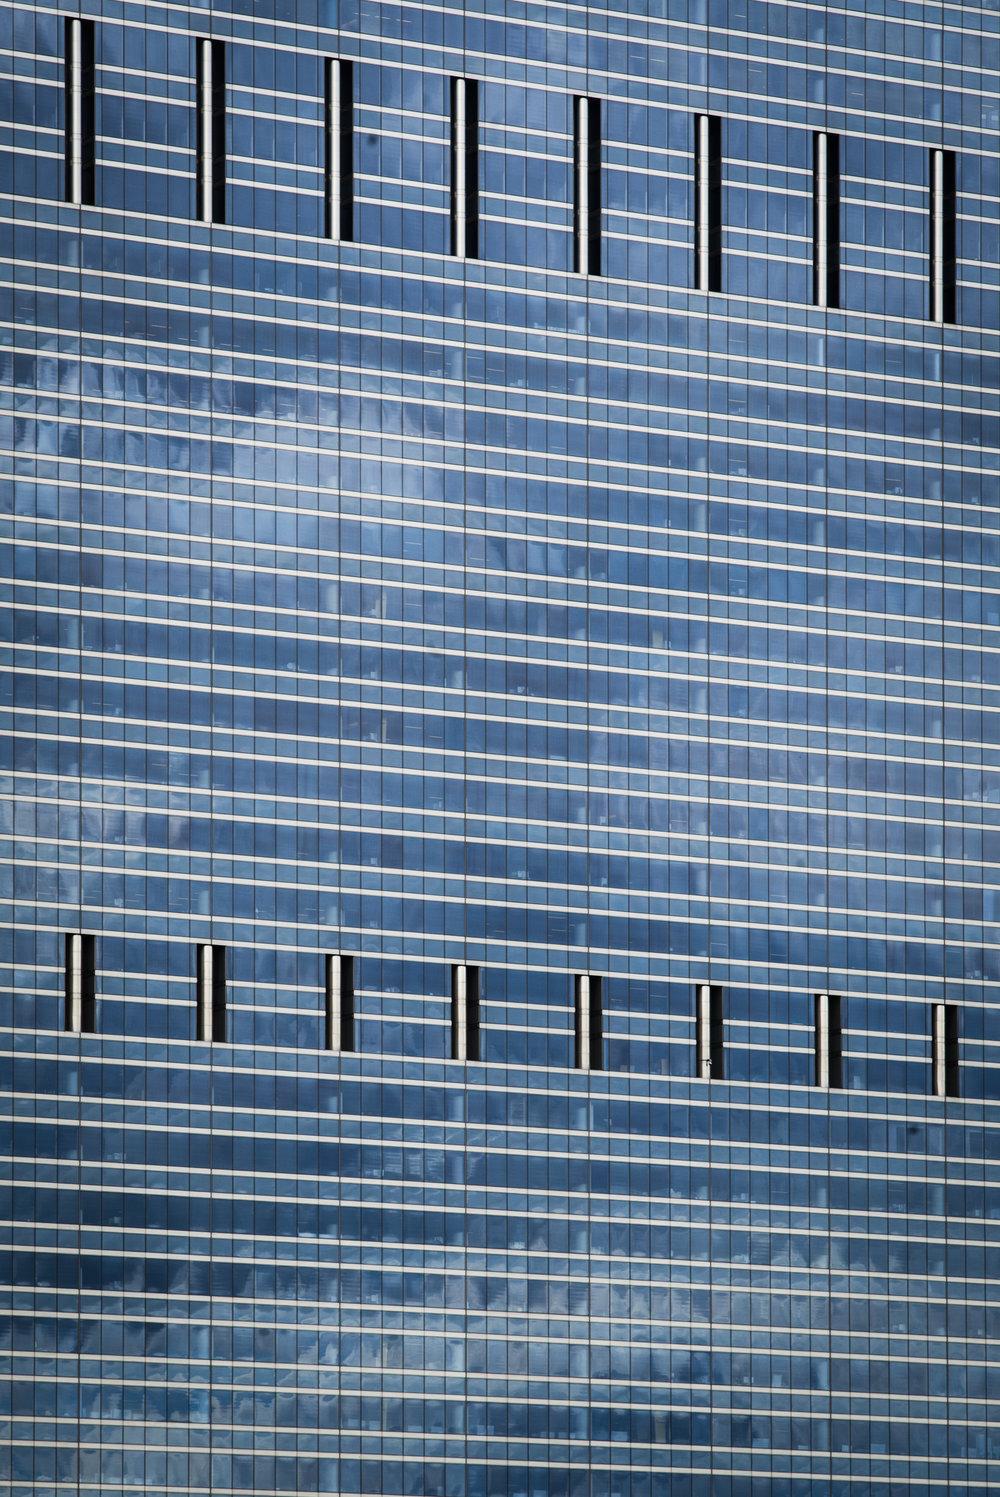 Architecture-L1000376-2.jpg